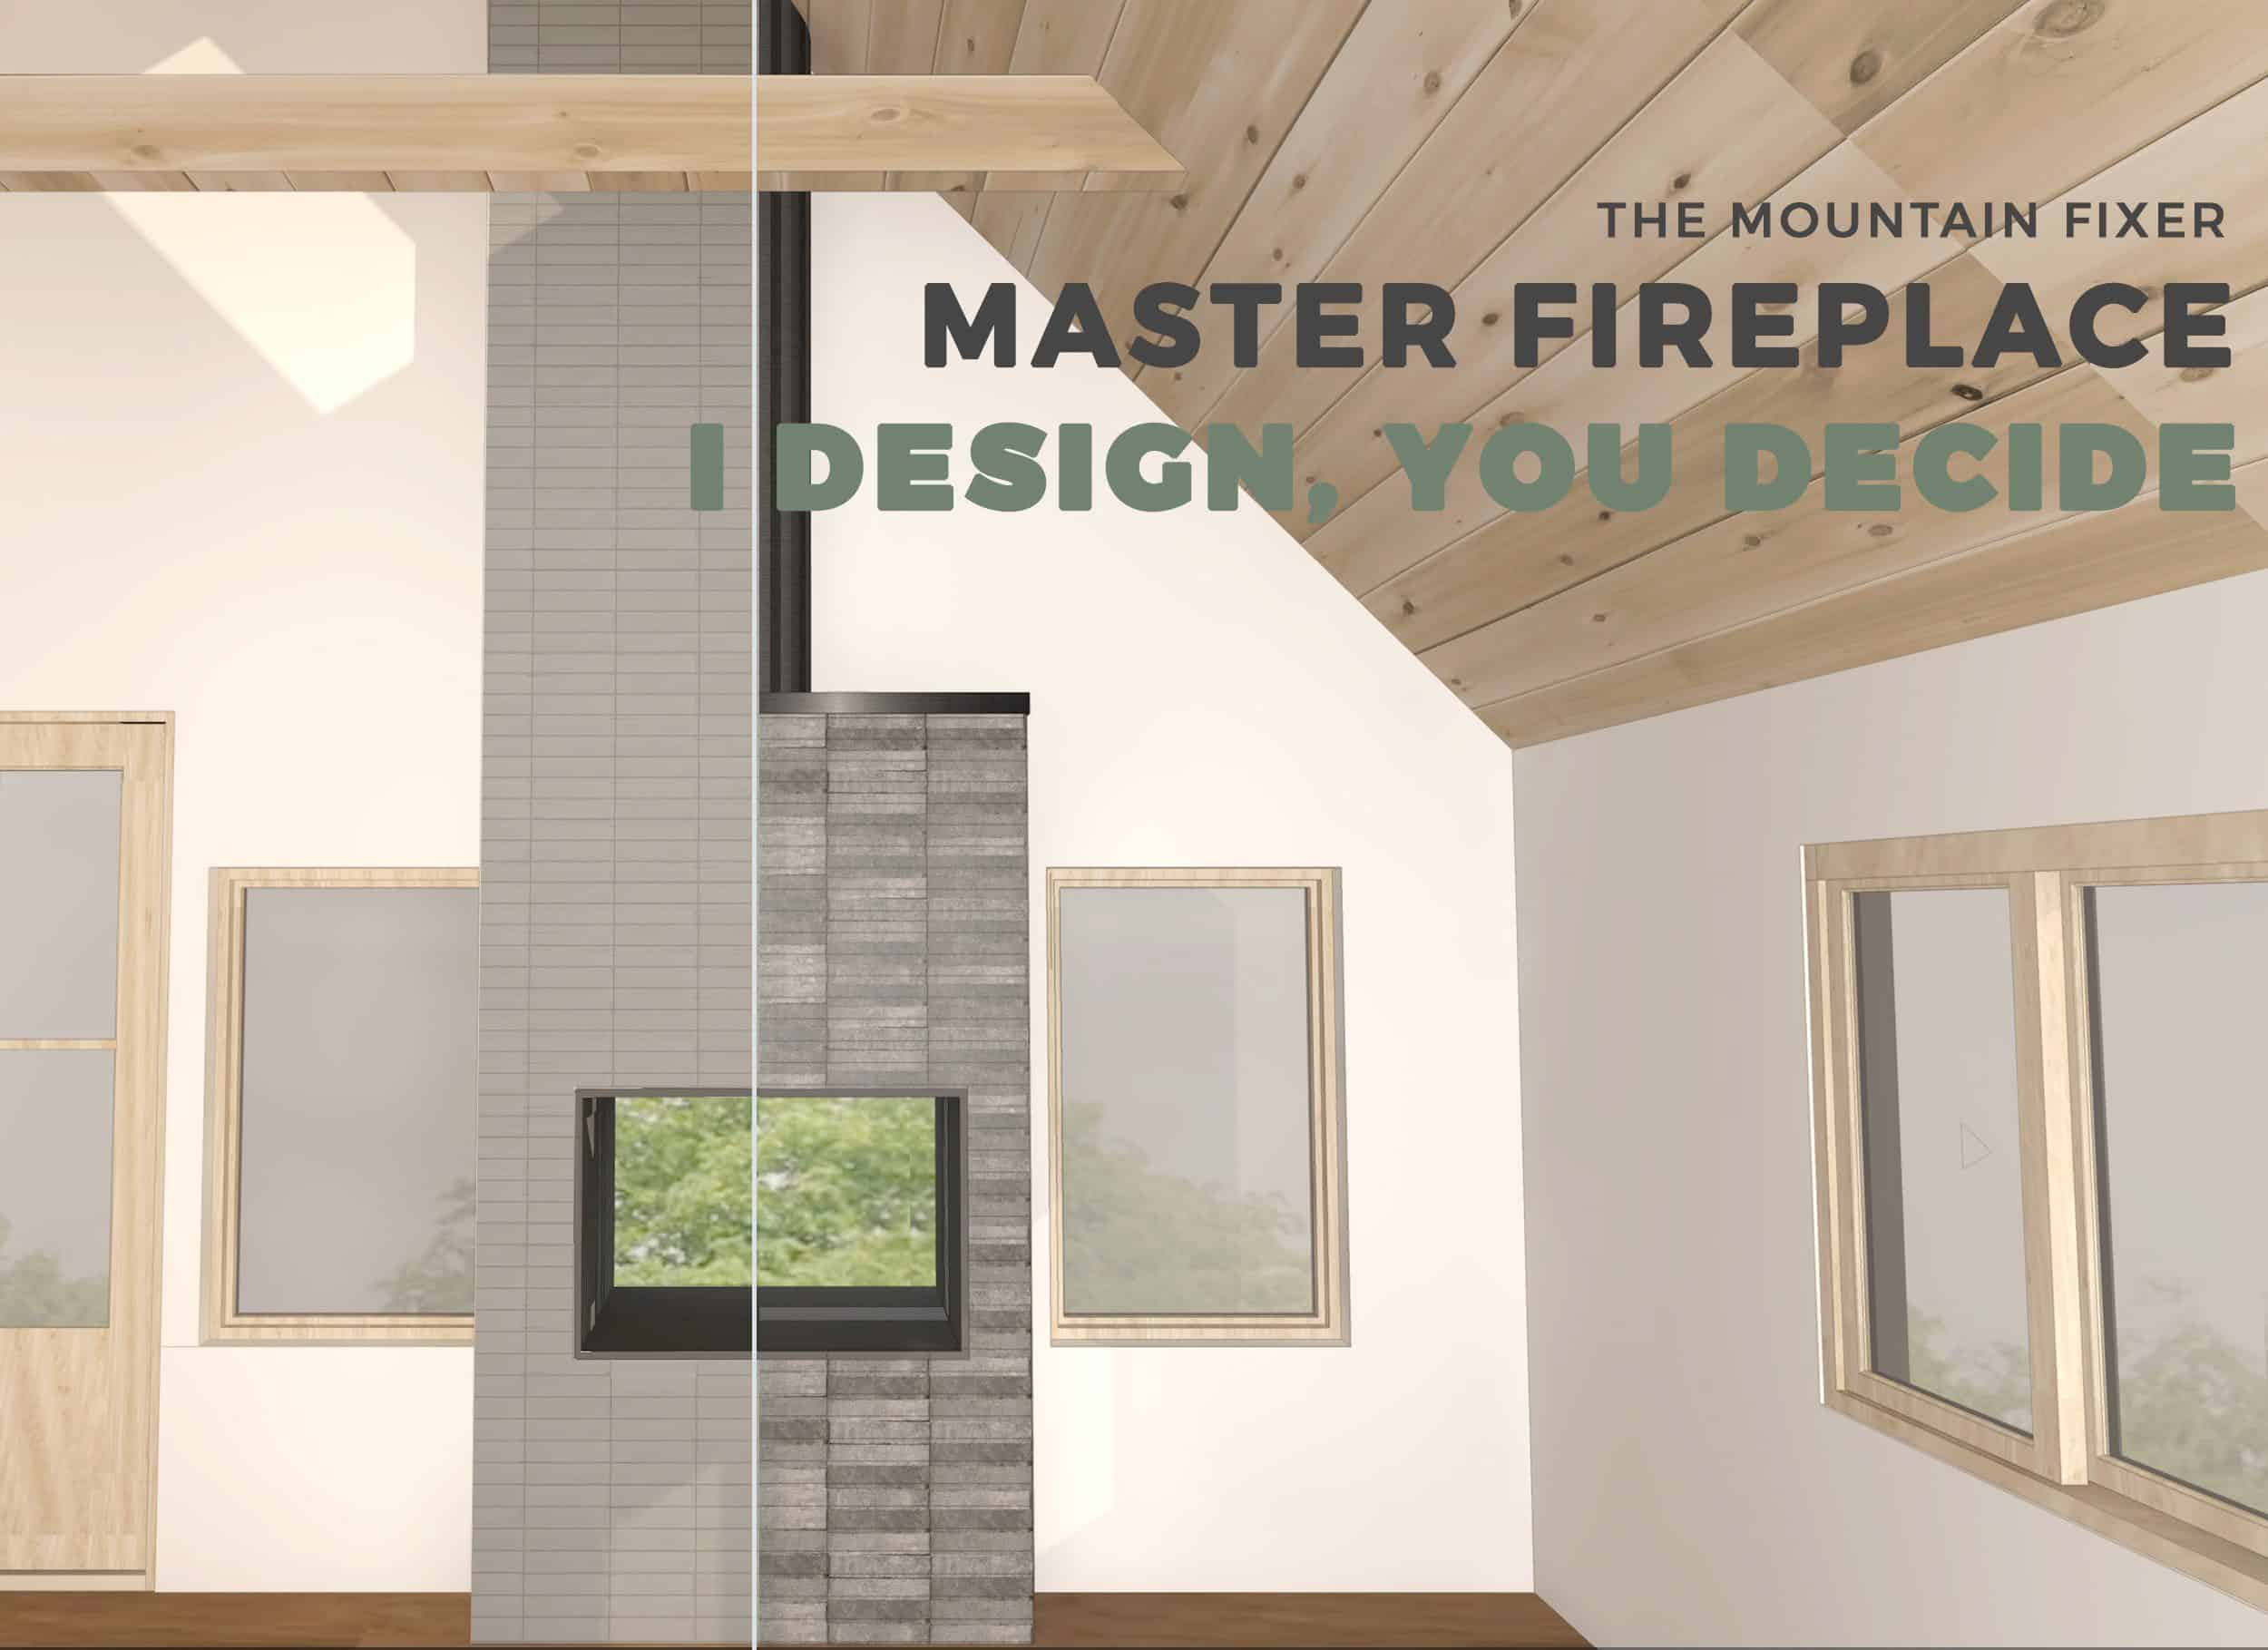 Emilyhendersondesign Mountain Fixer Master Fireplace I Design You Decide Opener 1